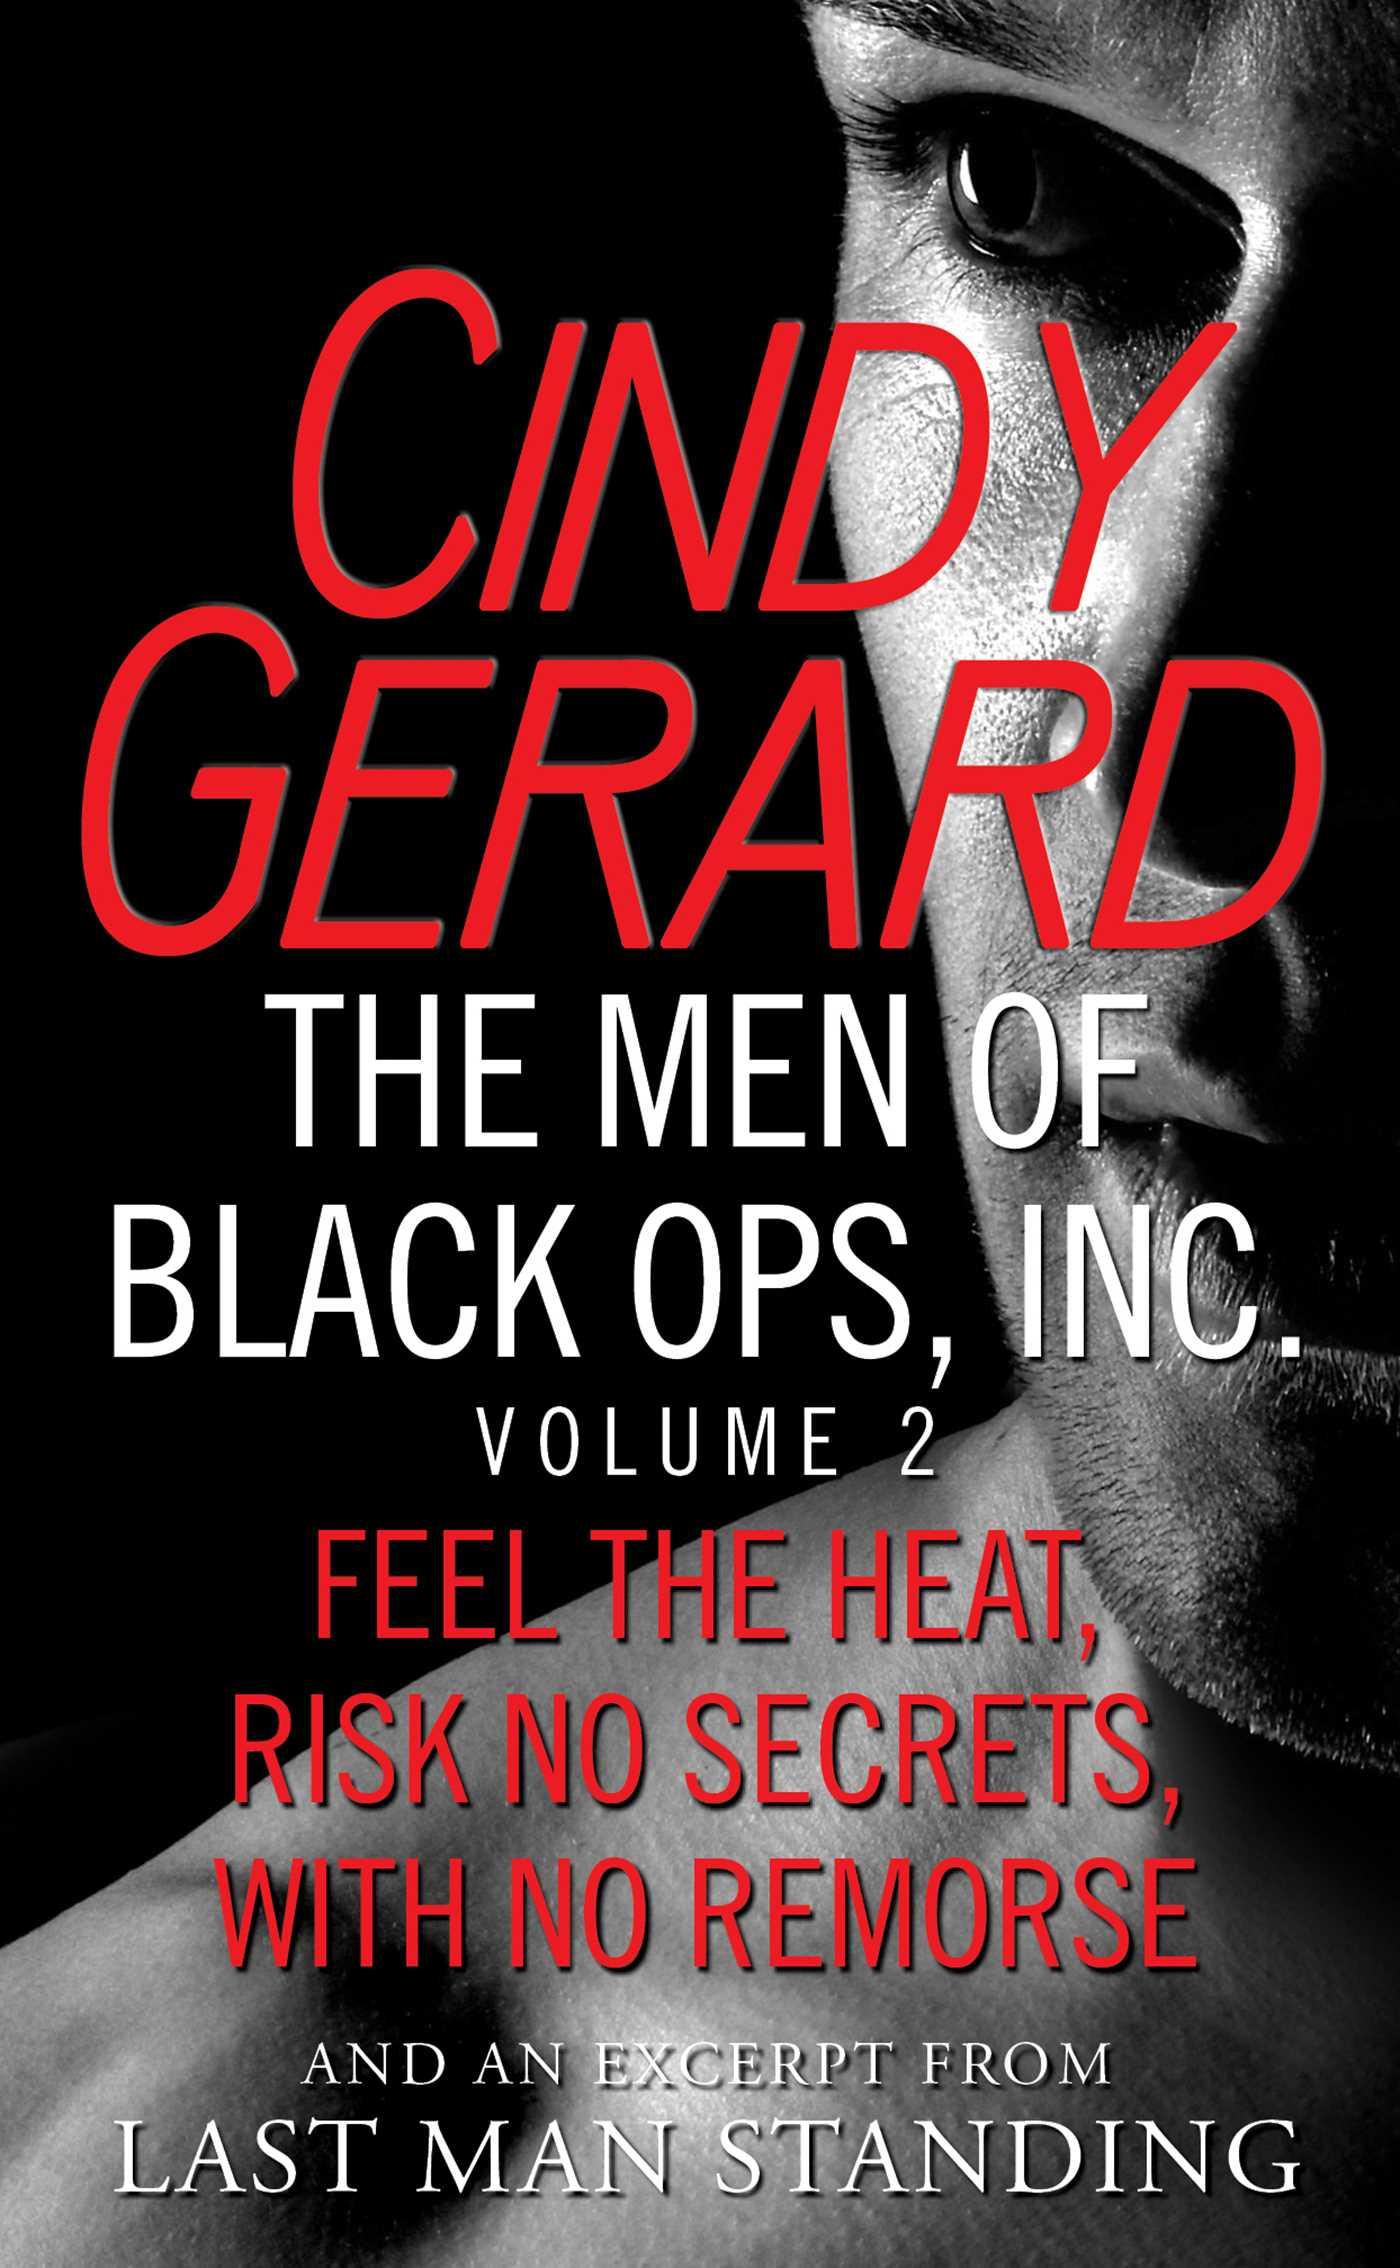 The men of black ops inc volume 2 9781451666847 hr